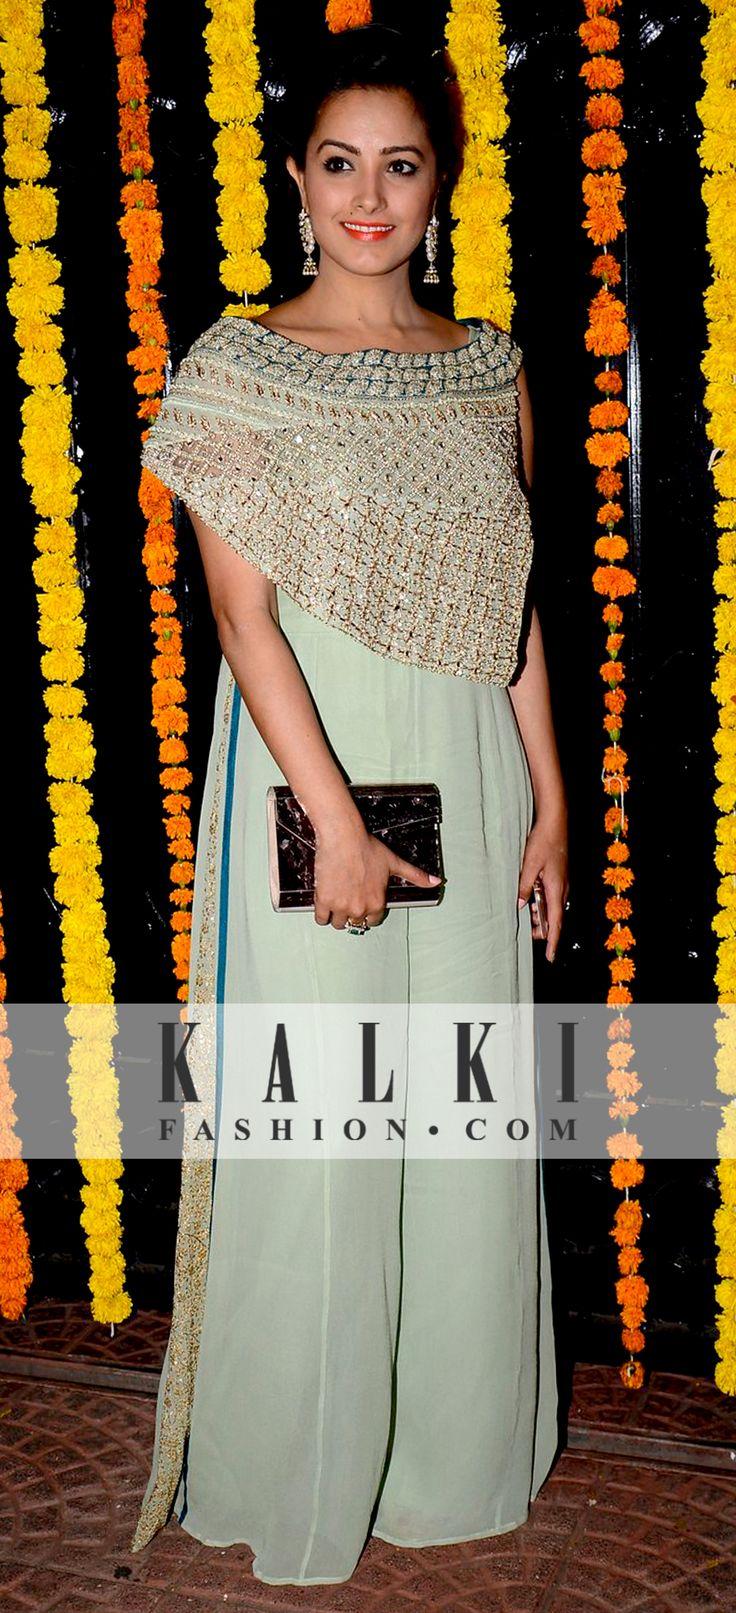 396 best zardozi taar images on Pinterest | Indian clothes, Indian ...